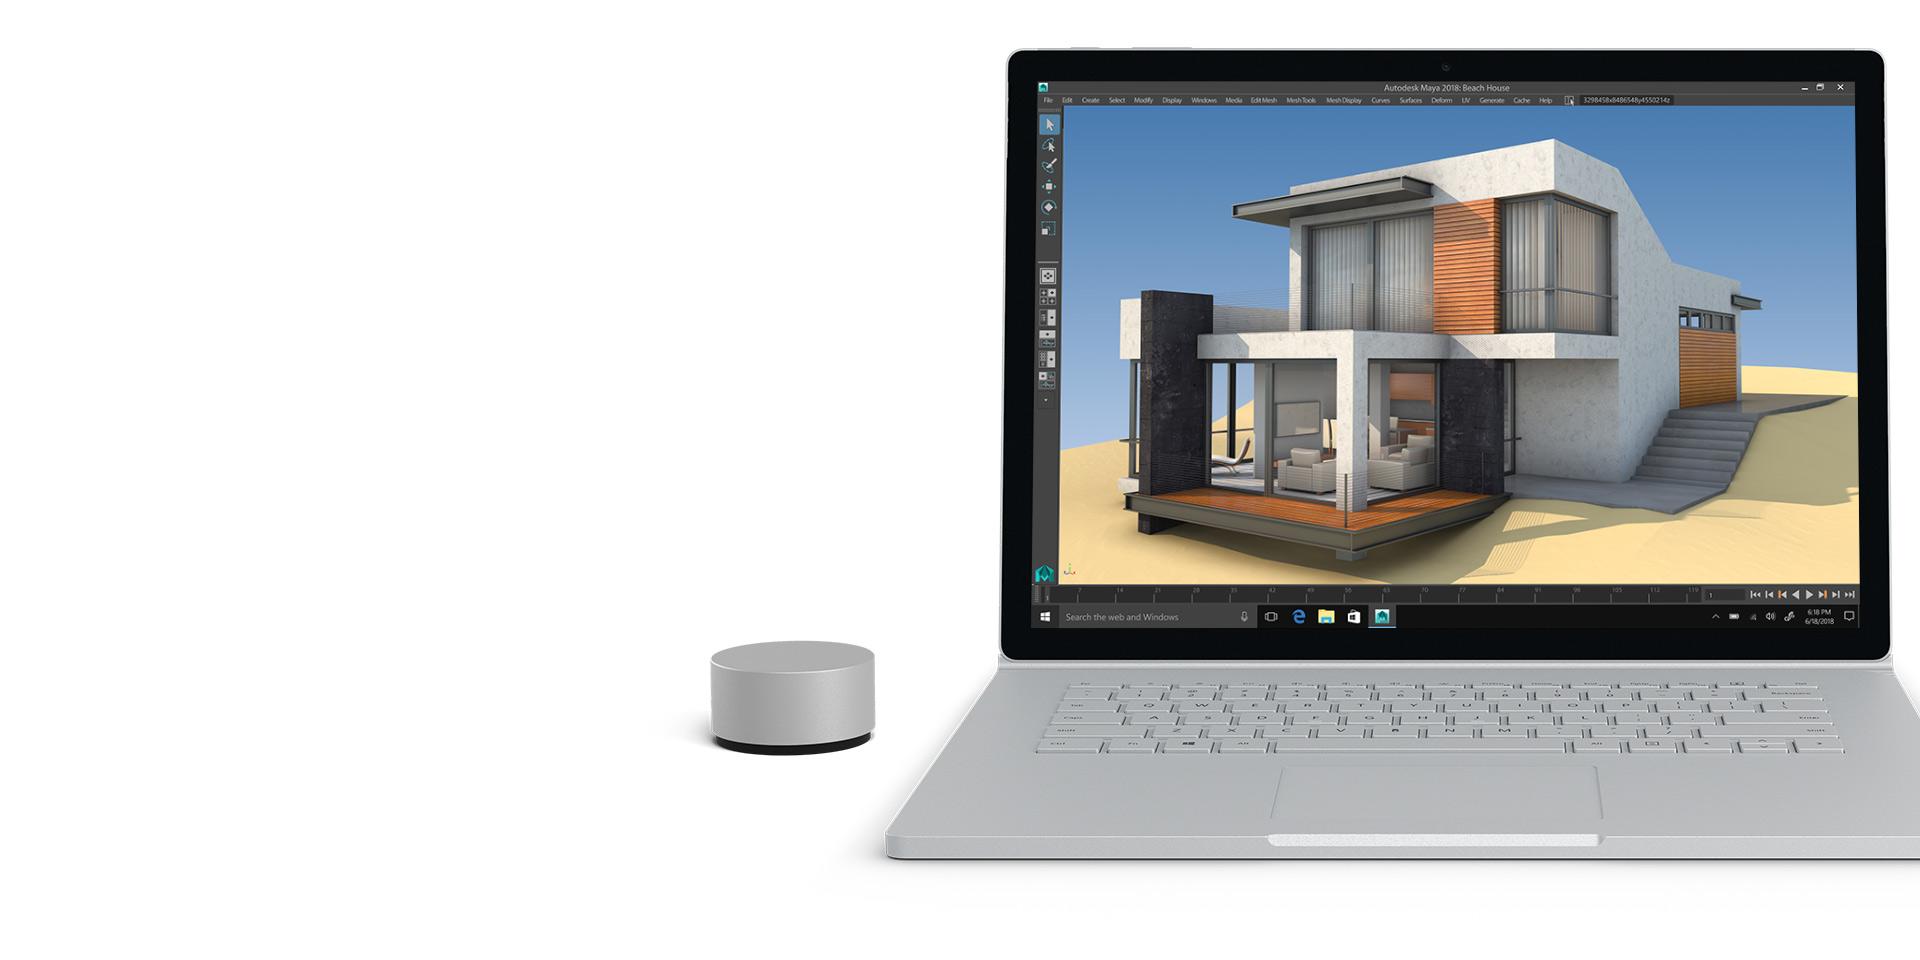 Surface Book 2 顯示器上的 Autodesk Maya